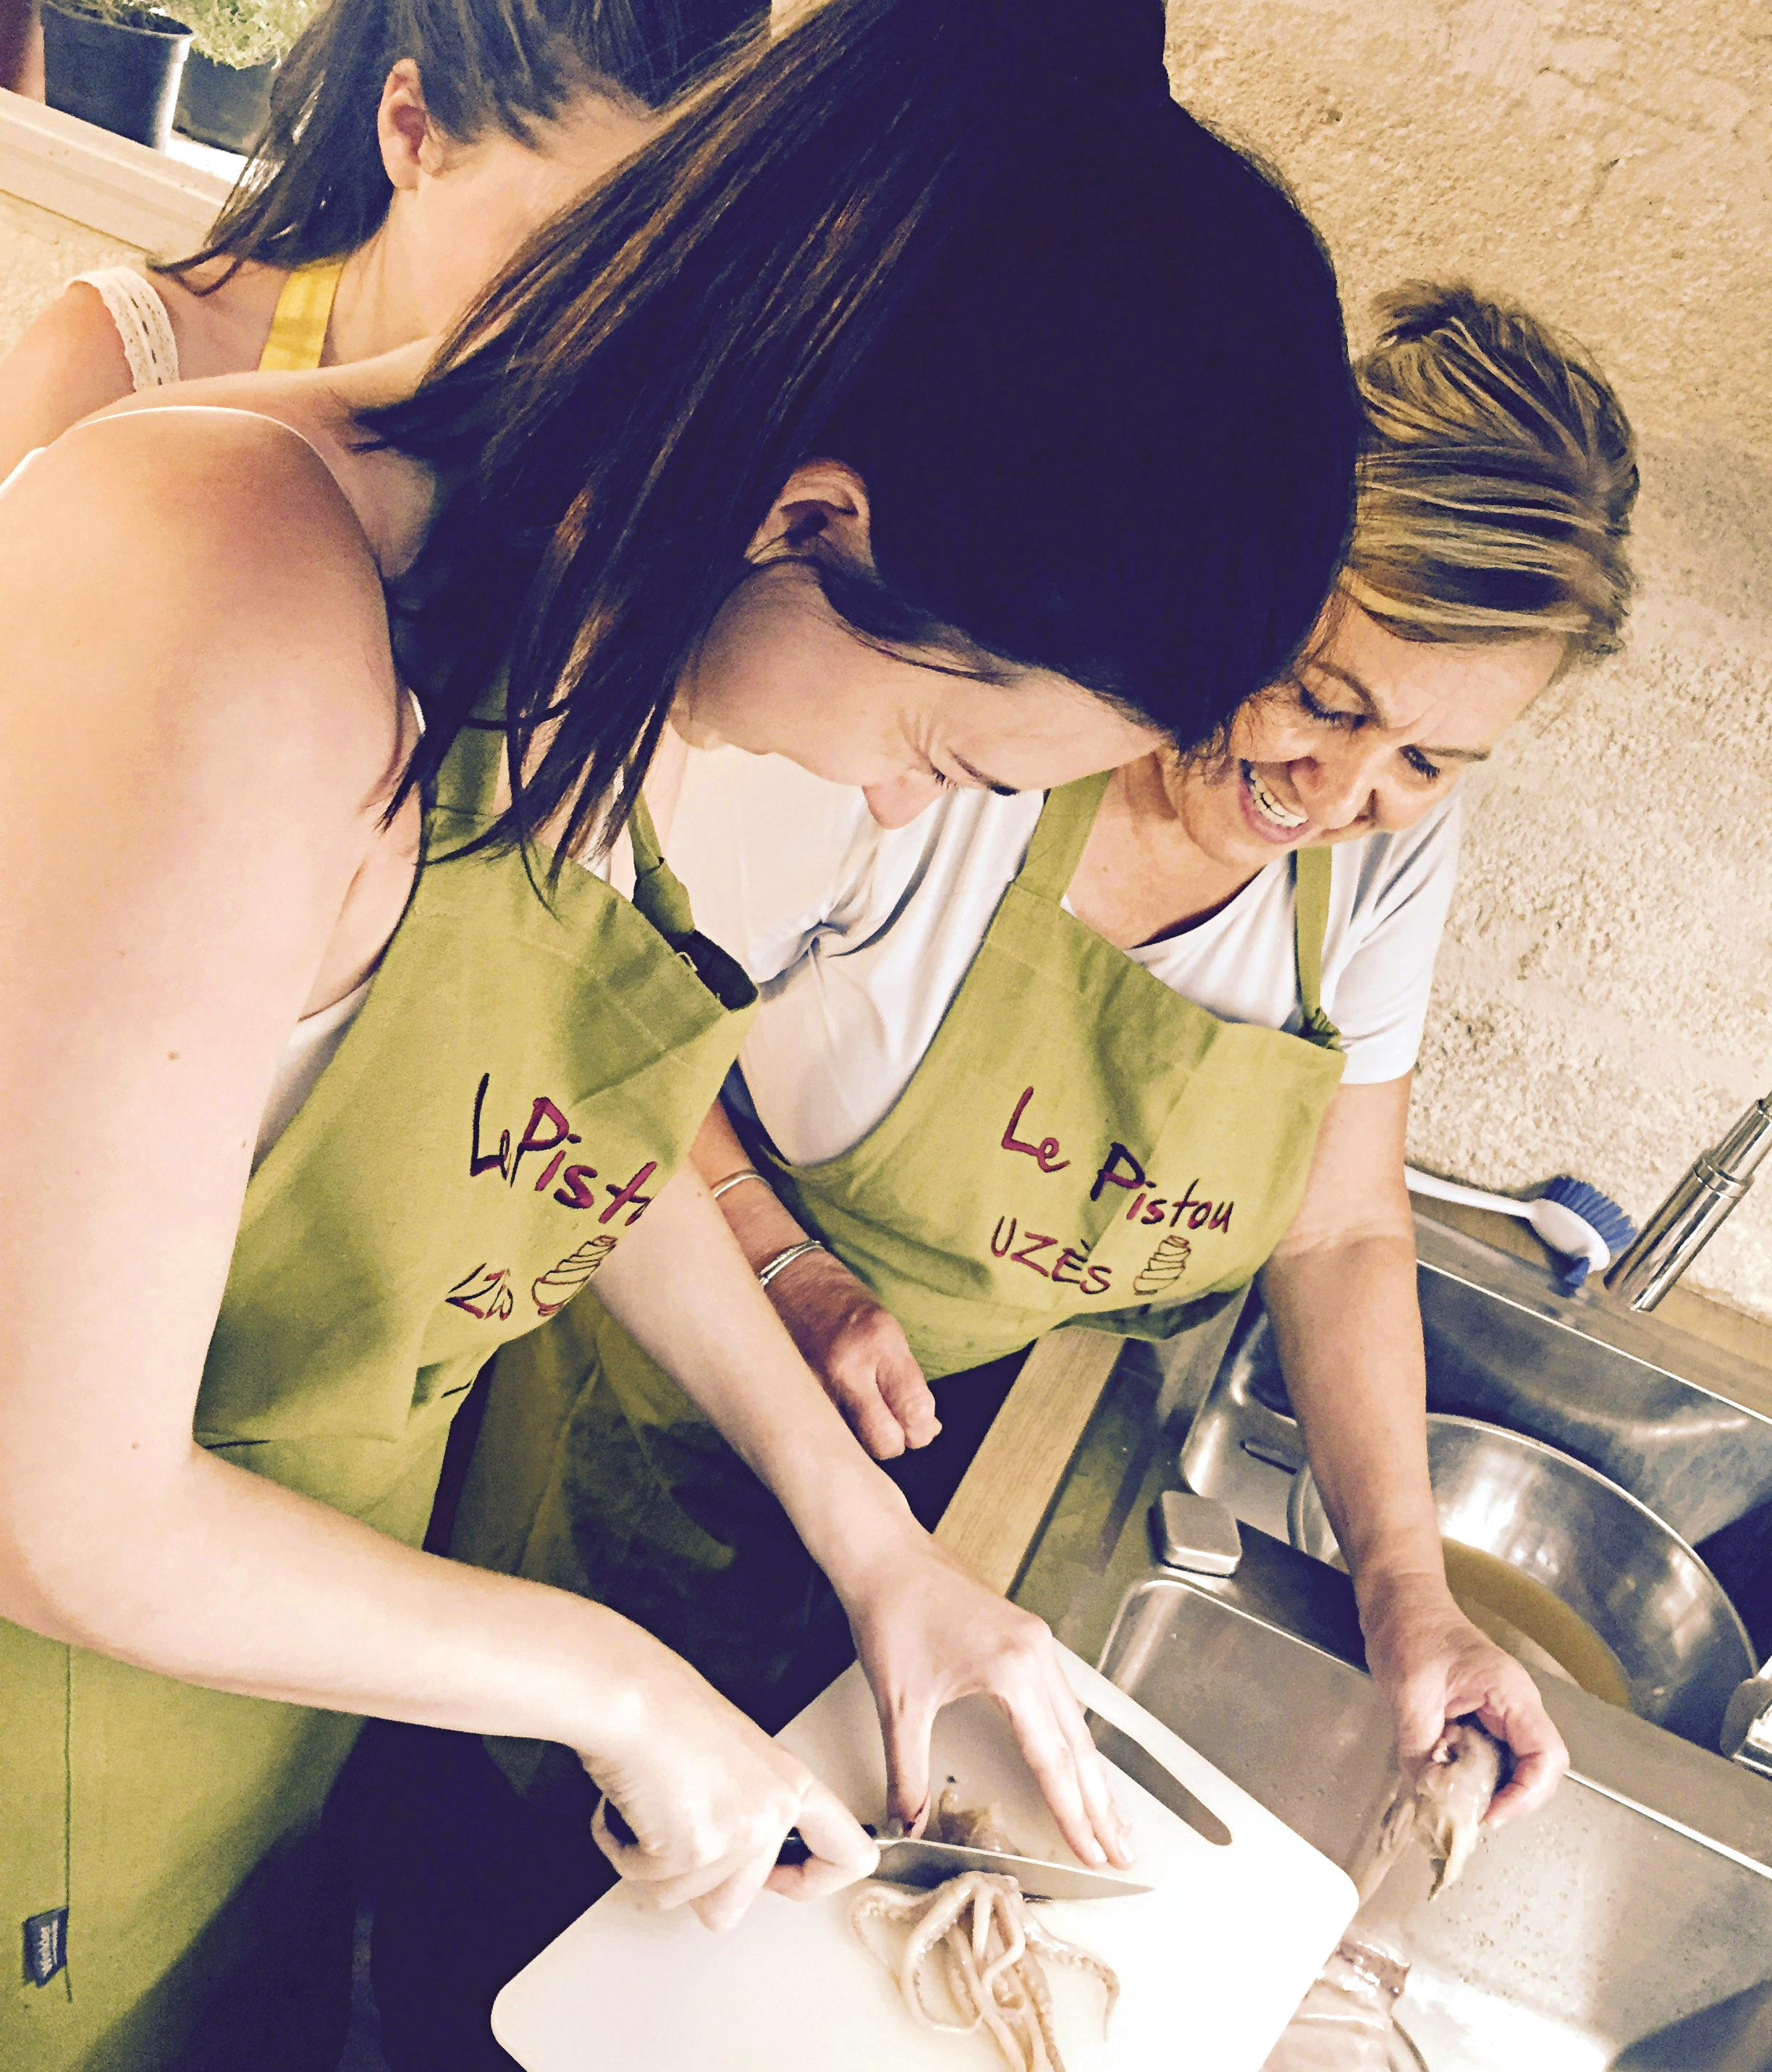 Le Pistou cookery school